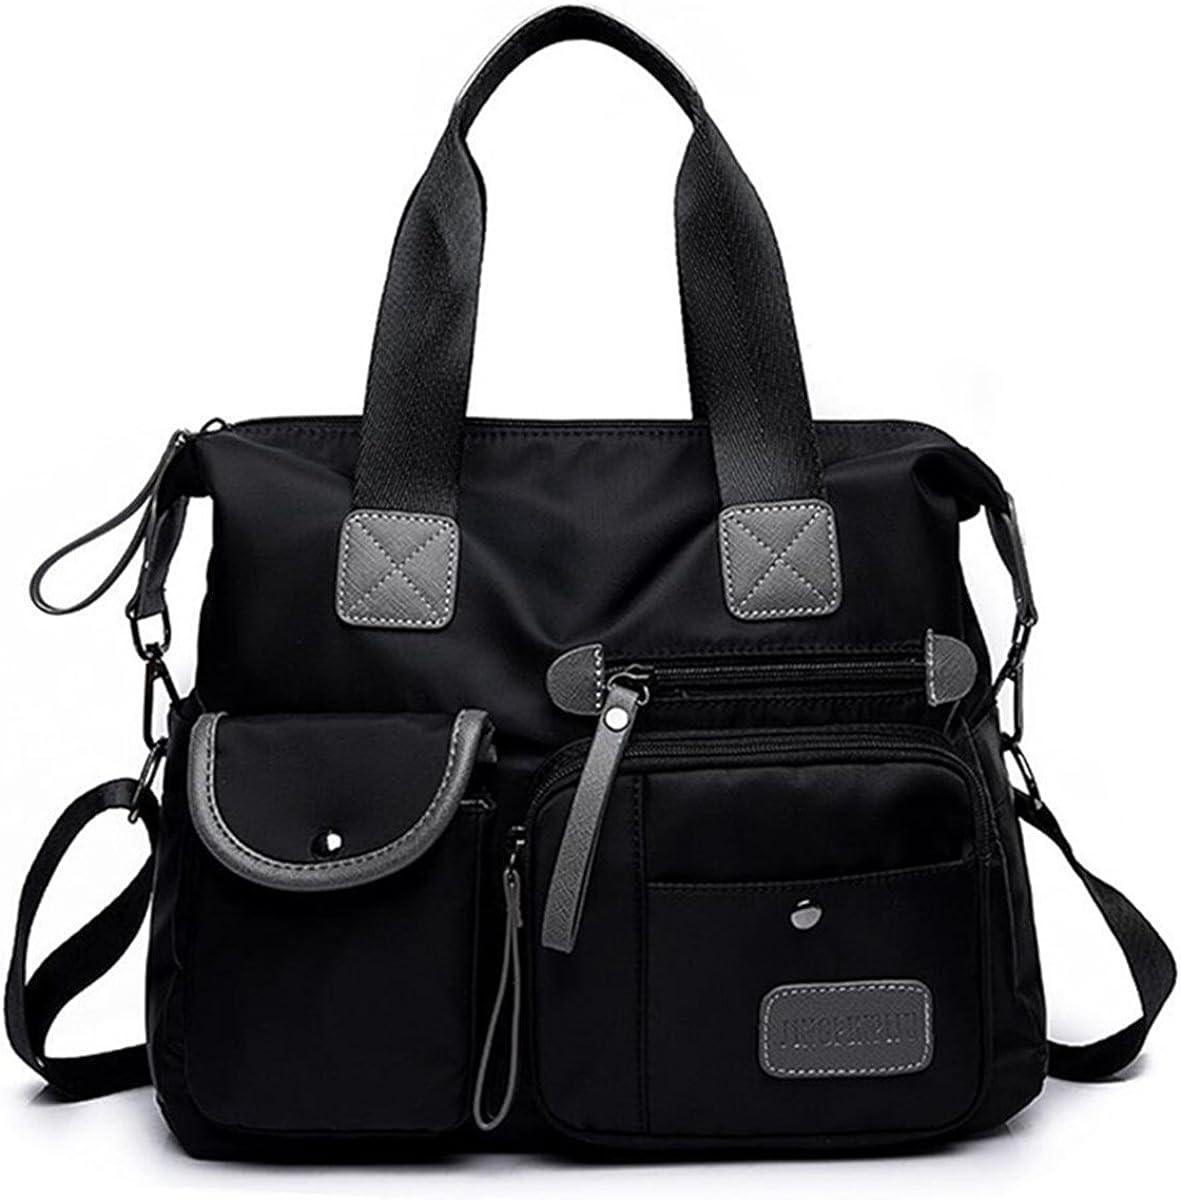 Women's Lightweight Floral Top Handle Handbag Multi-pockets Nylon Work Totes Water Resistant Travel Crossbody Shoulder Bag